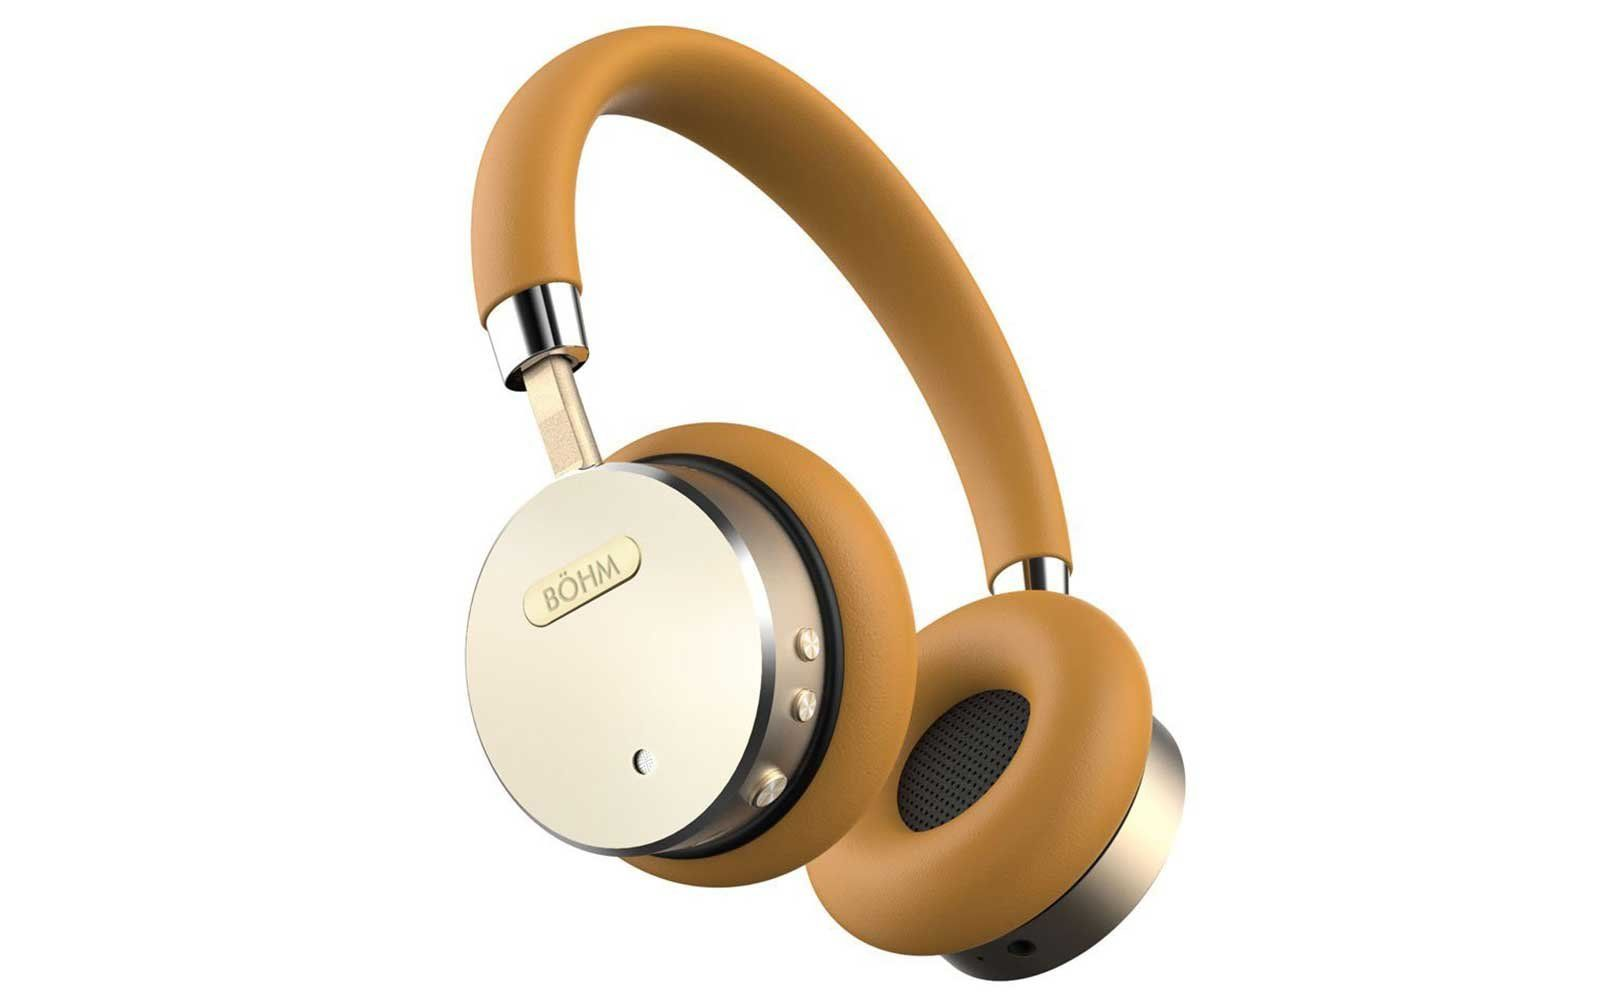 13 Travel-friendly Headphones That Will Make Any Trip More Enjoyable ... 4298b19f4a38f